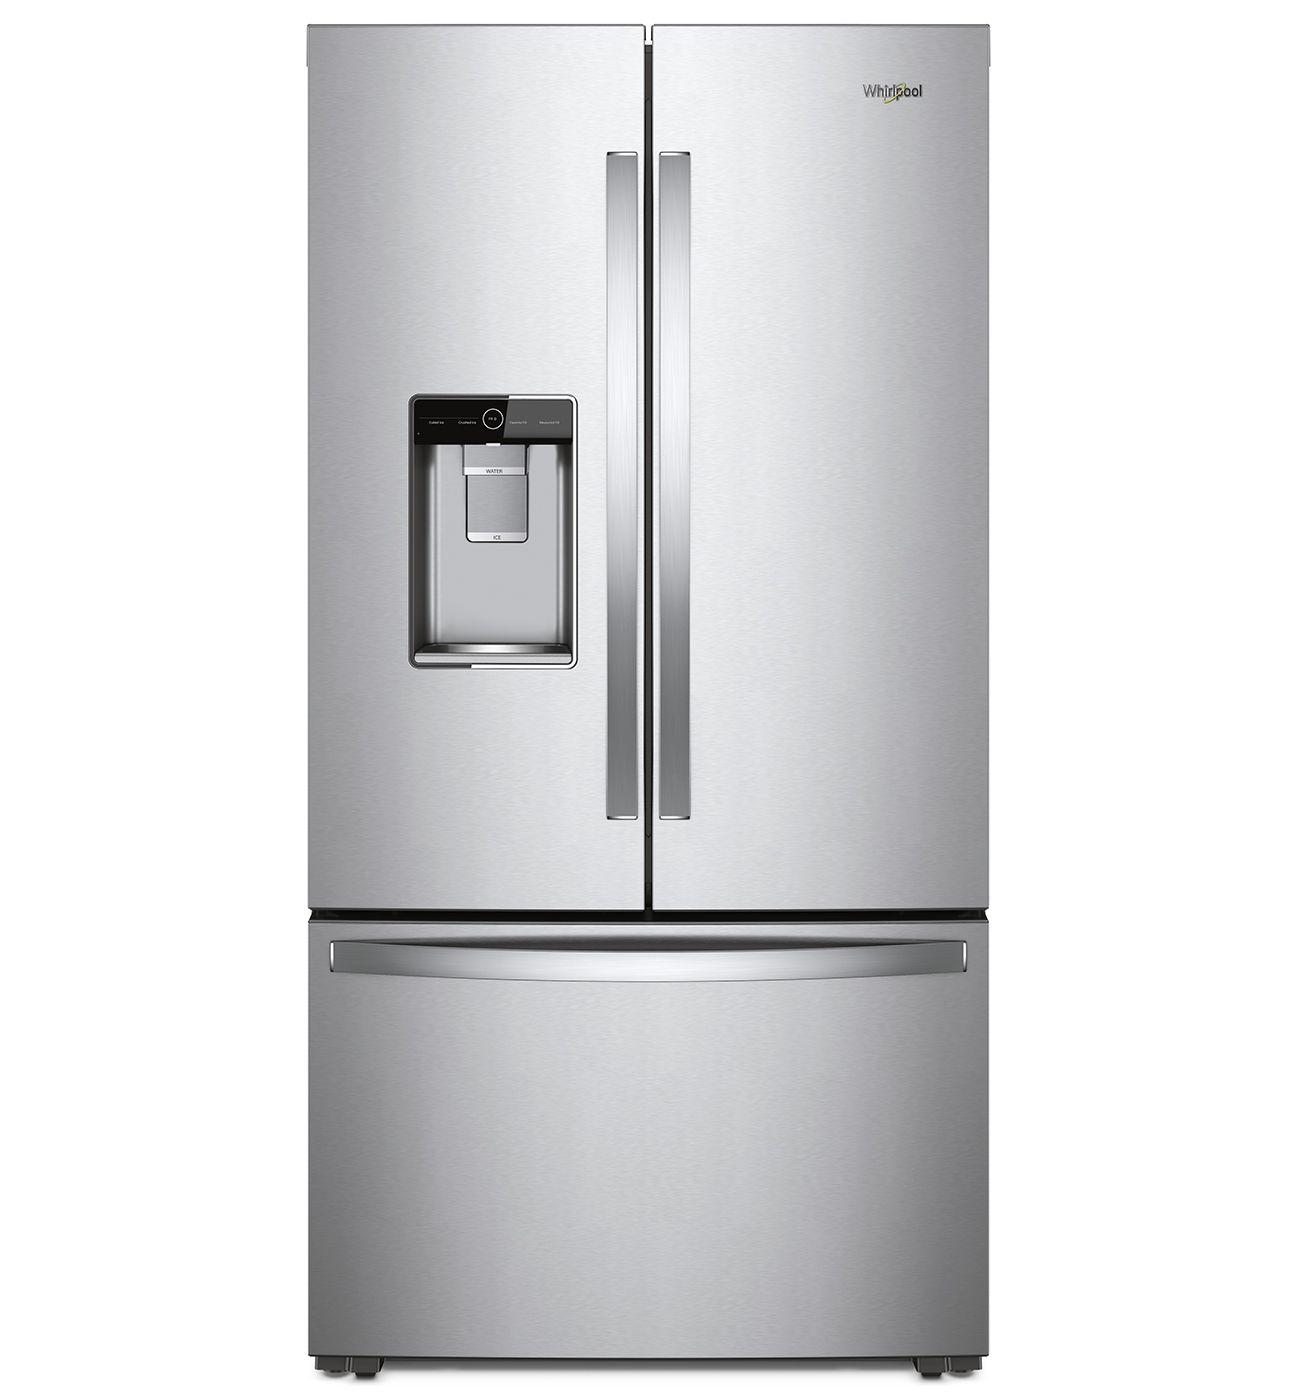 Wrf954cihz By Whirlpool French Door Refrigerators Goedekers Com French Door Refrigerators French Doors Refrigerator